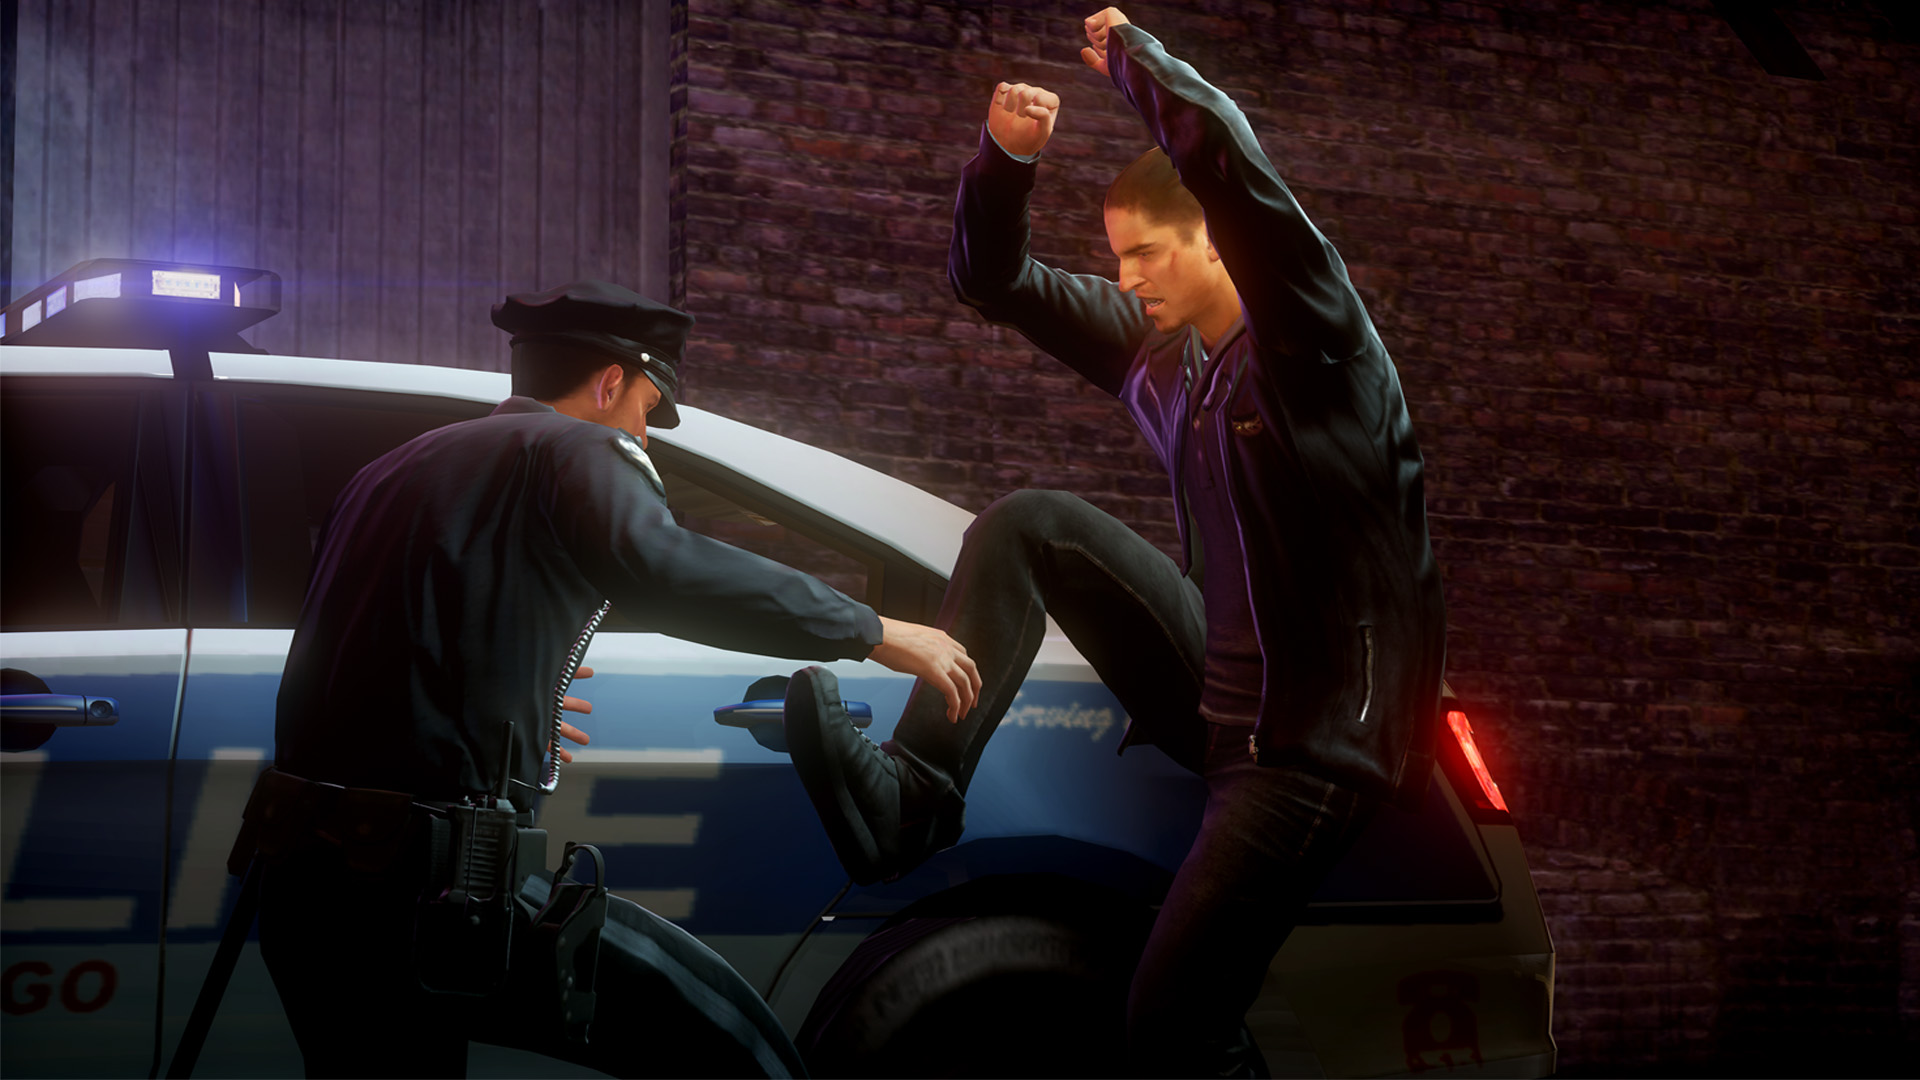 Need for Speed: The Run Screenshot 7